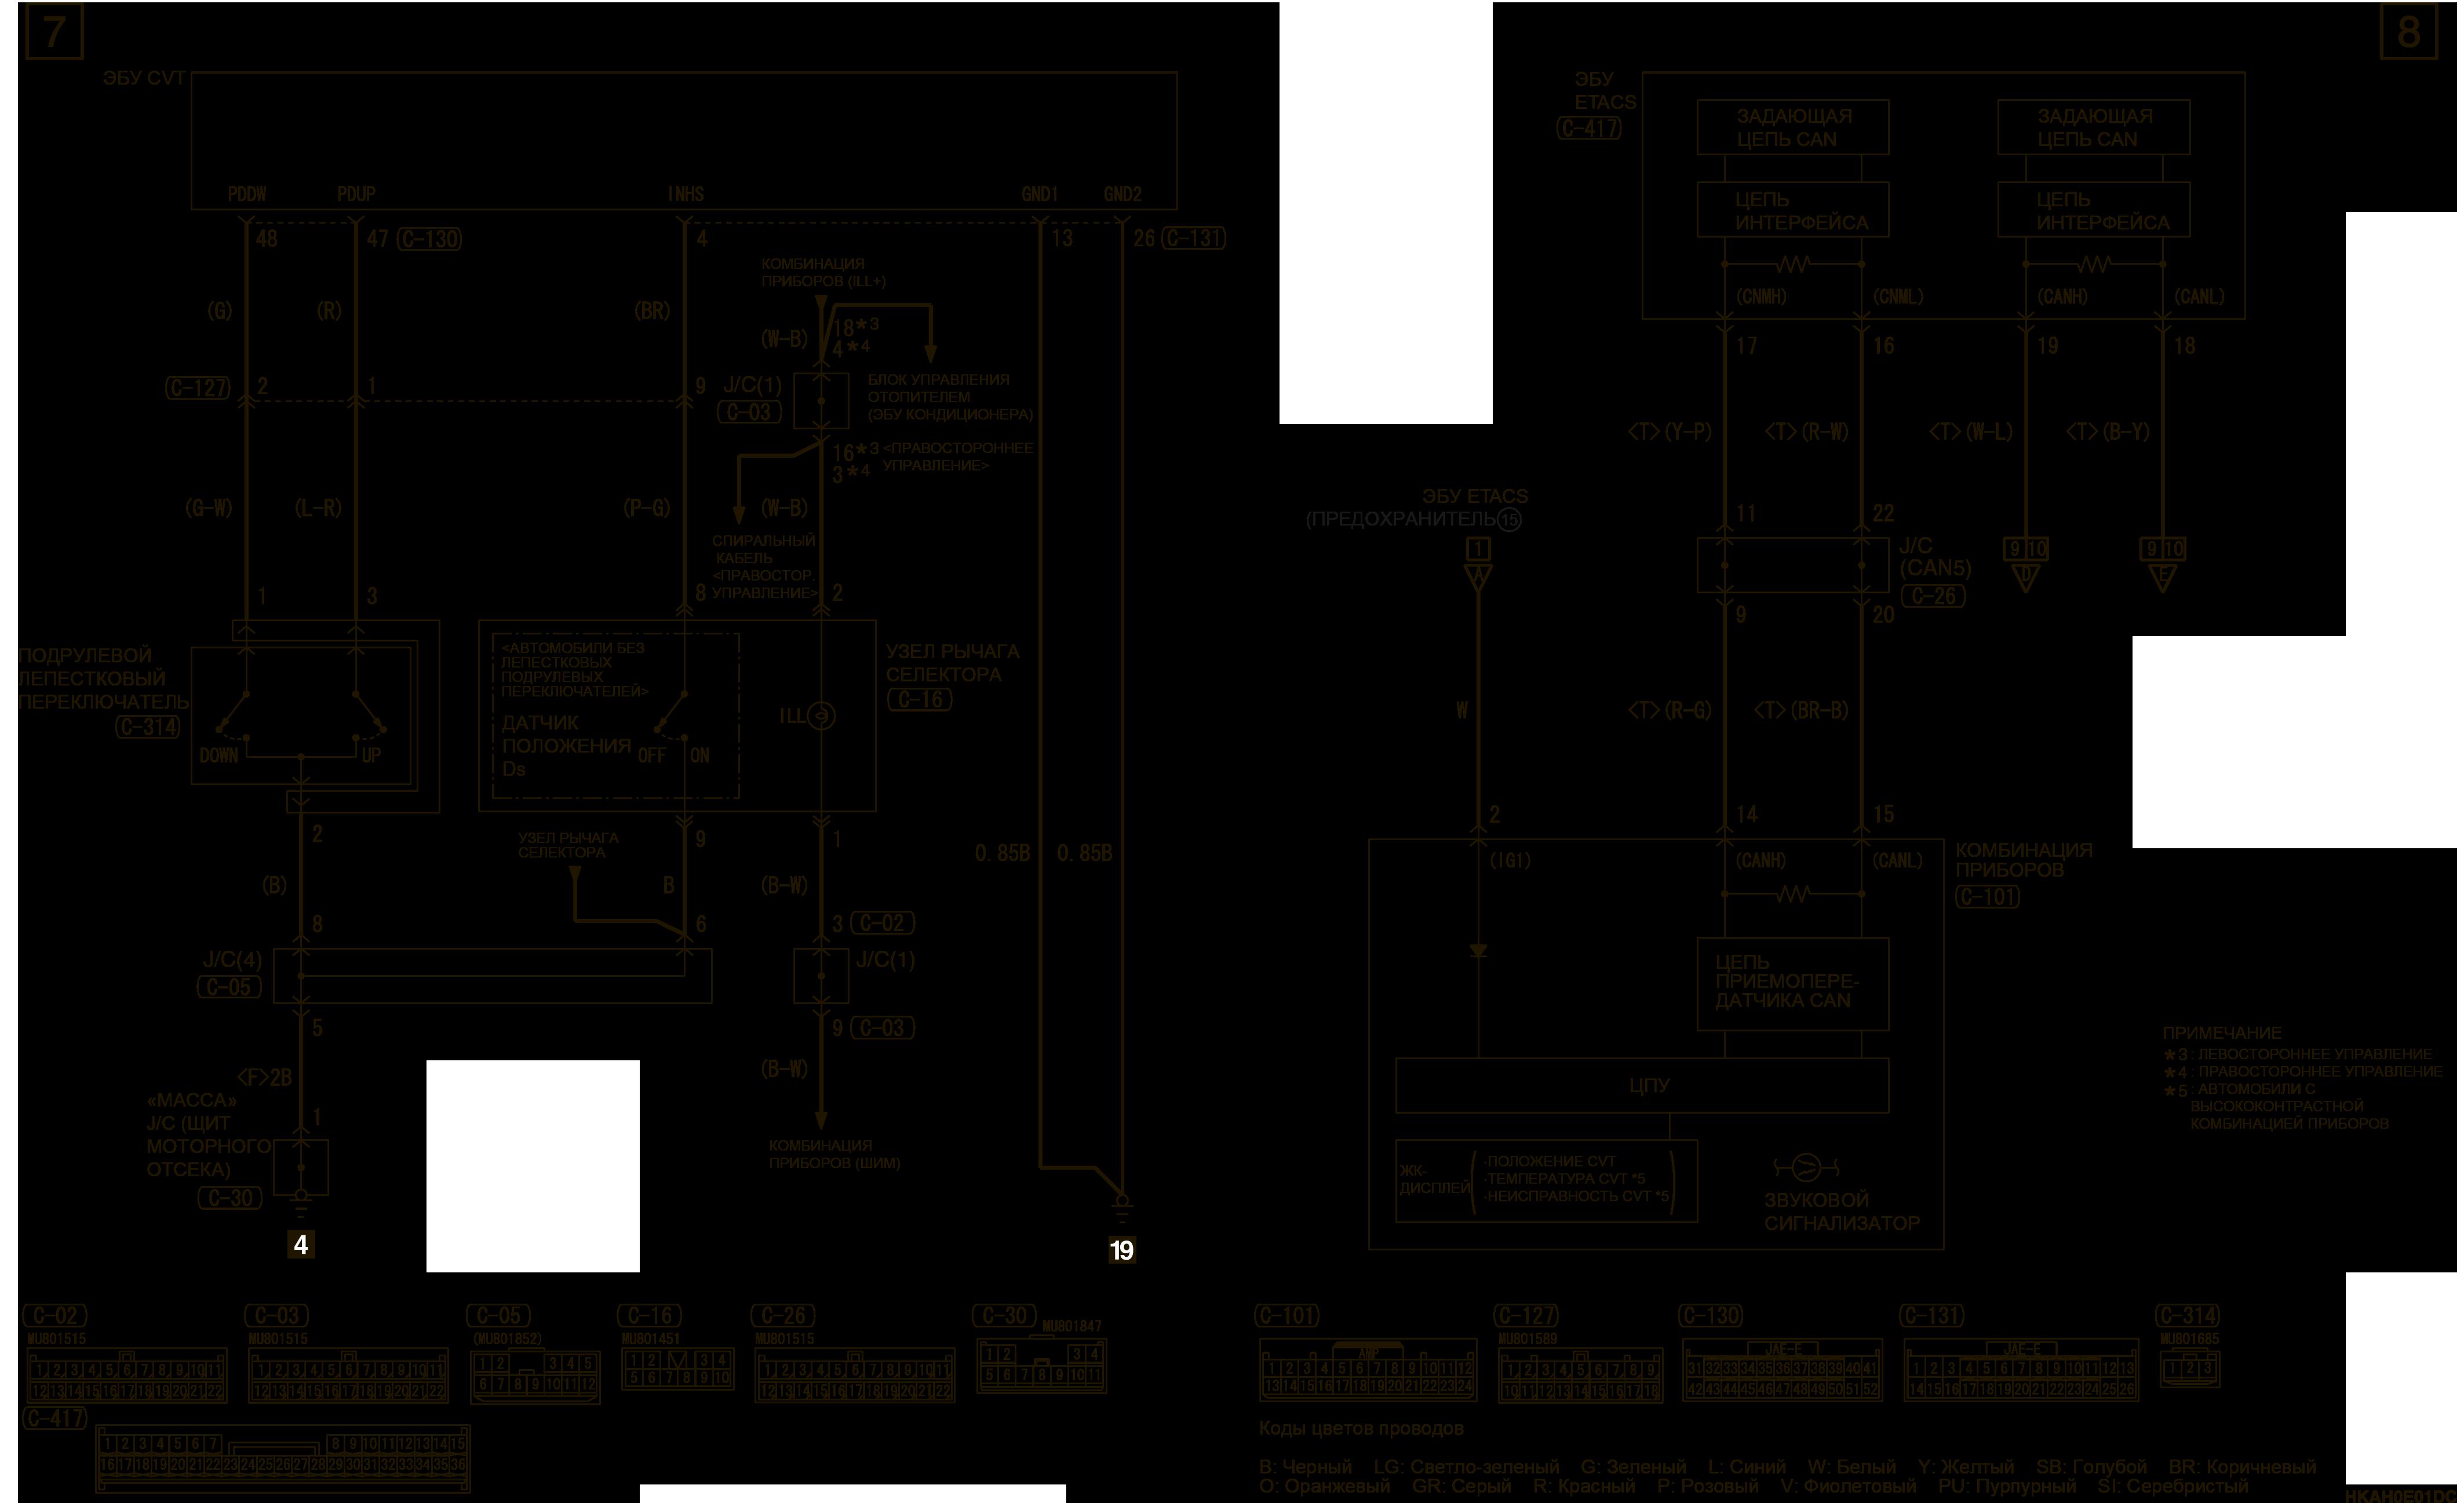 mmc аутлендер 3 2019 электросхемаCVT АВТОМОБИЛИ БЕЗ СИСТЕМЫ AS&G